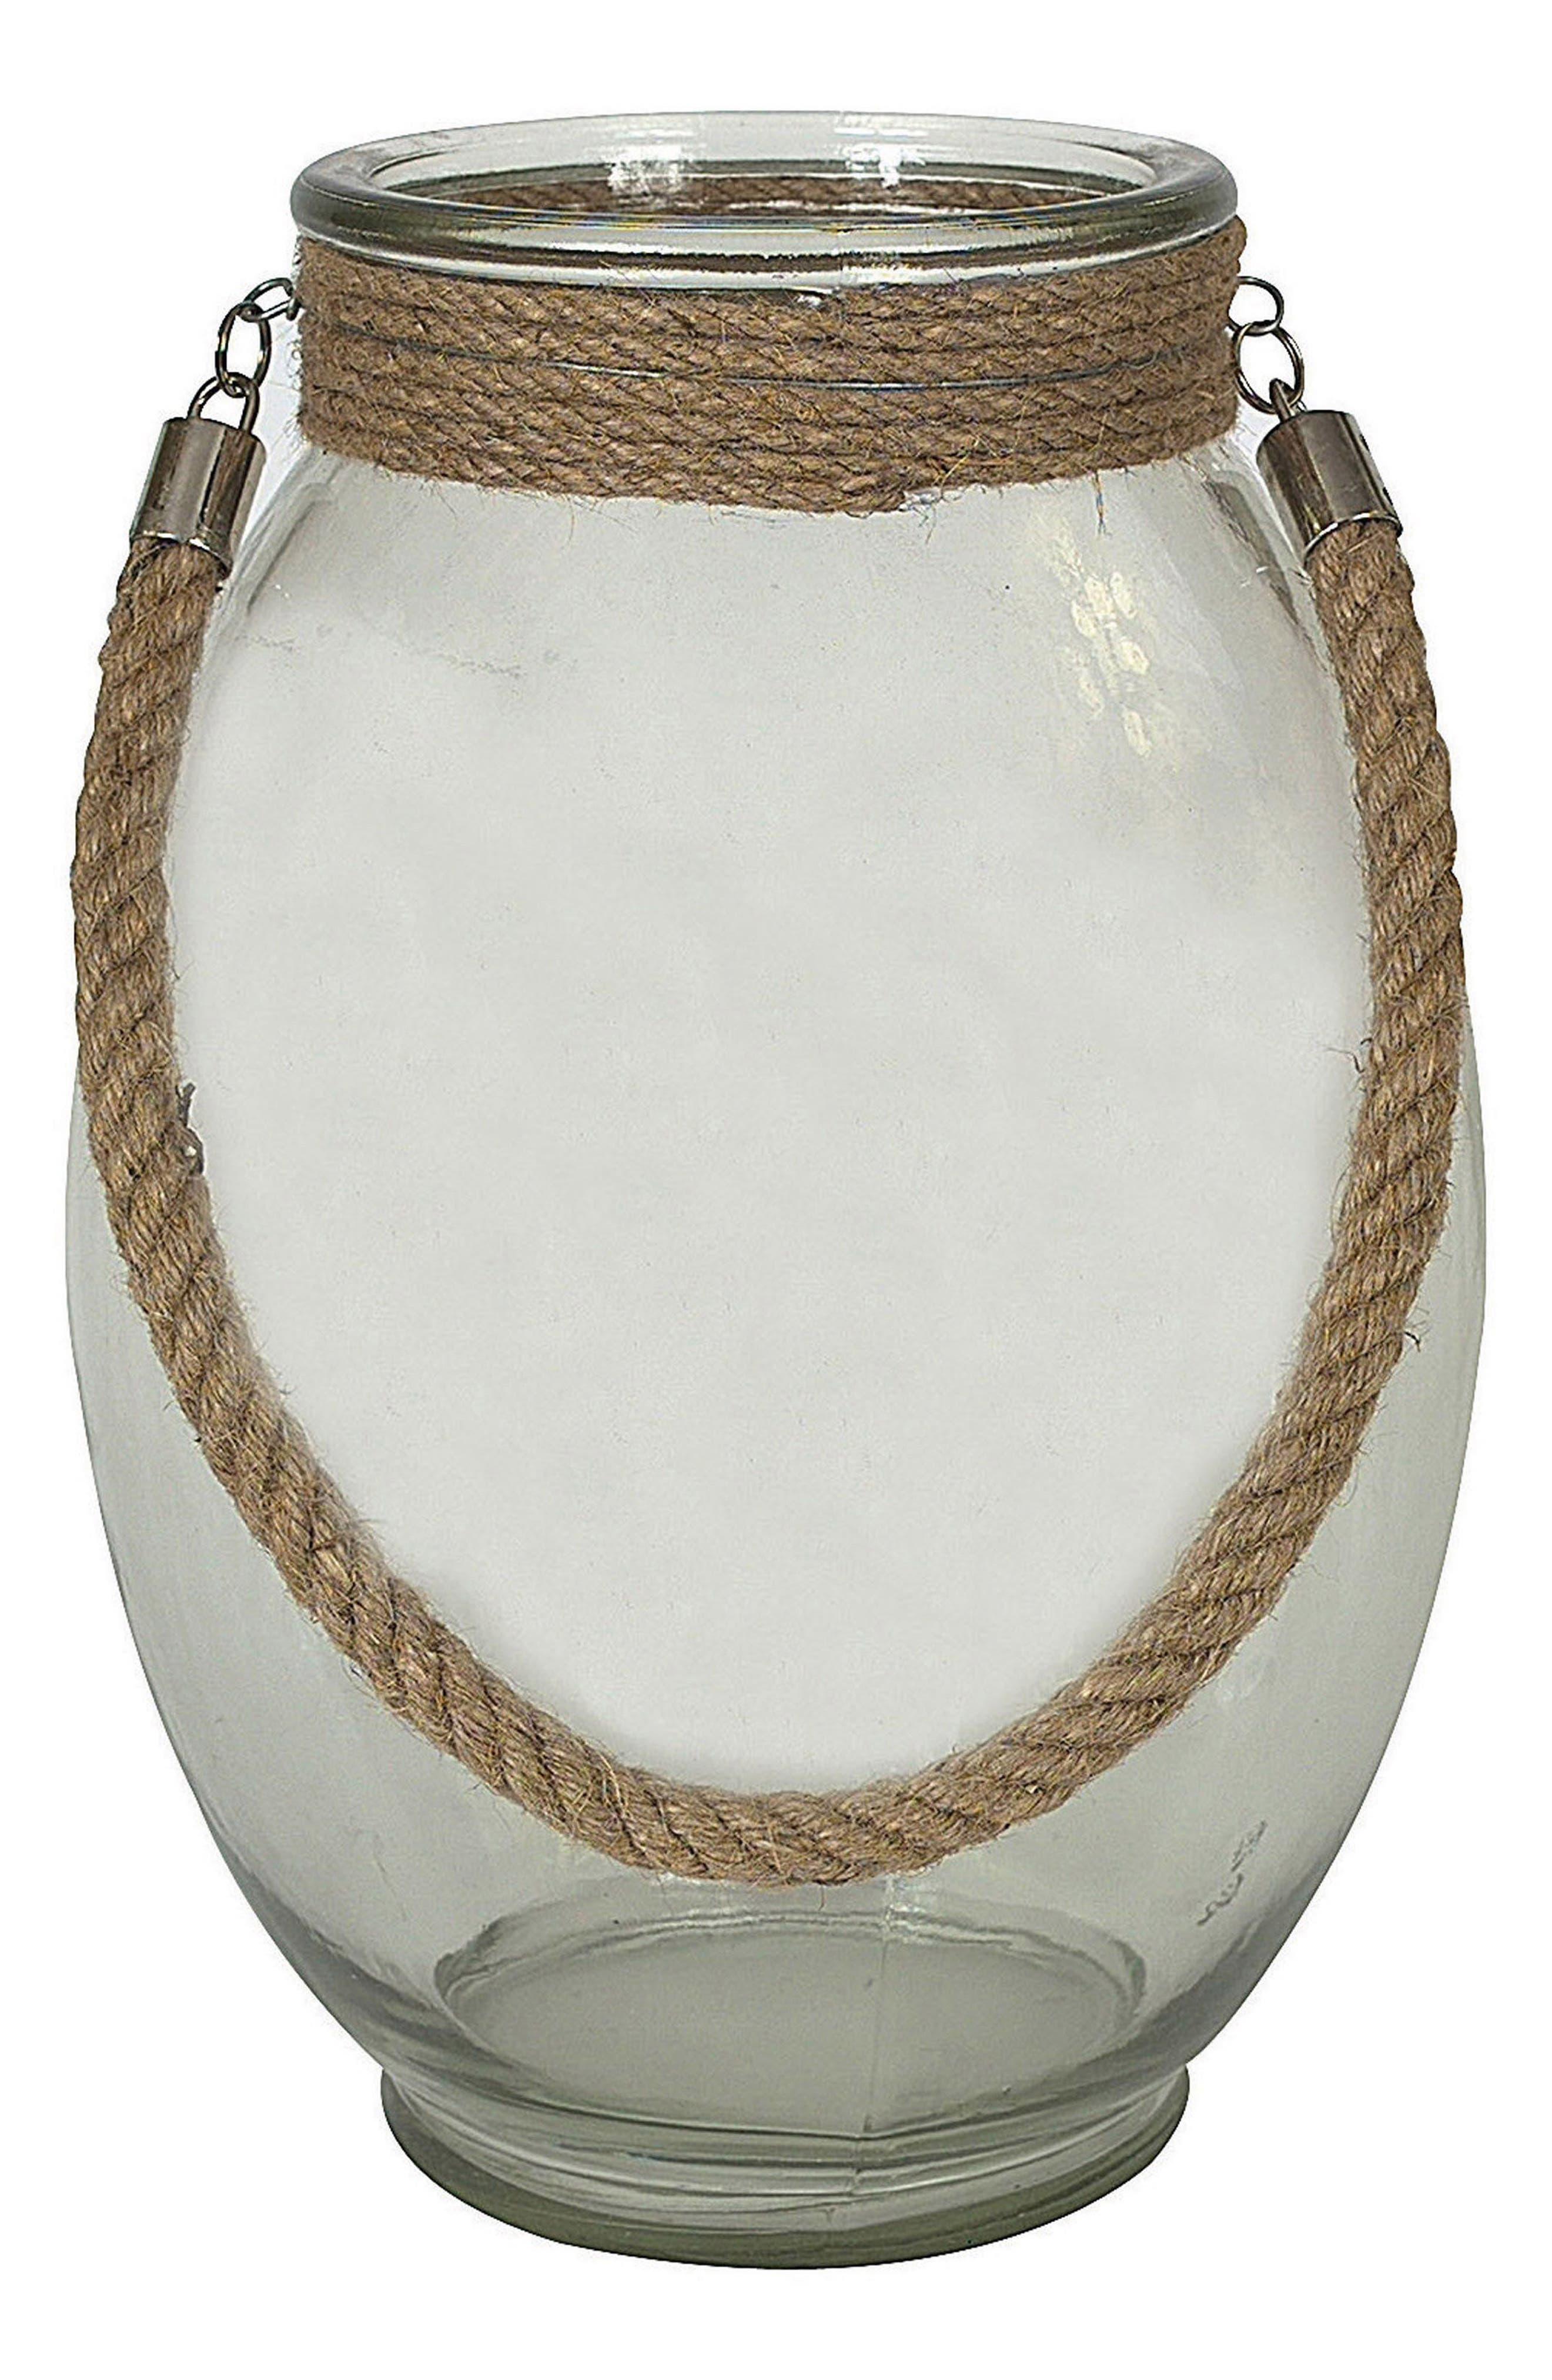 Alternate Image 1 Selected - Creative Co-Op Glass Vase